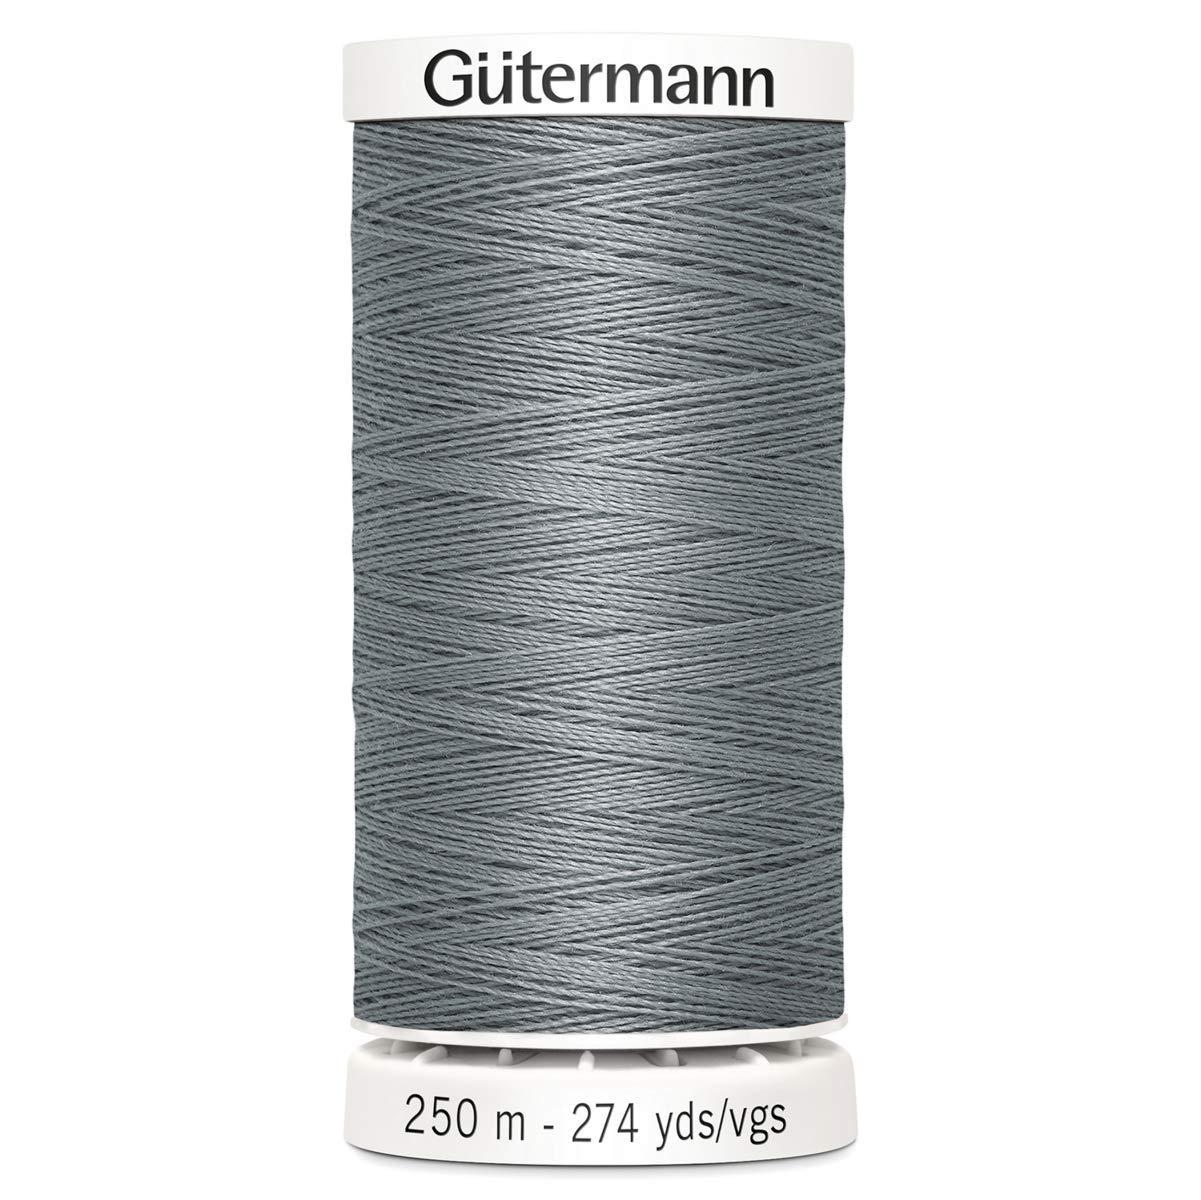 Gutermann Sew All Polyester Thread, 250Mtr, Silver Grey (0040) GUT_717878_0040-1